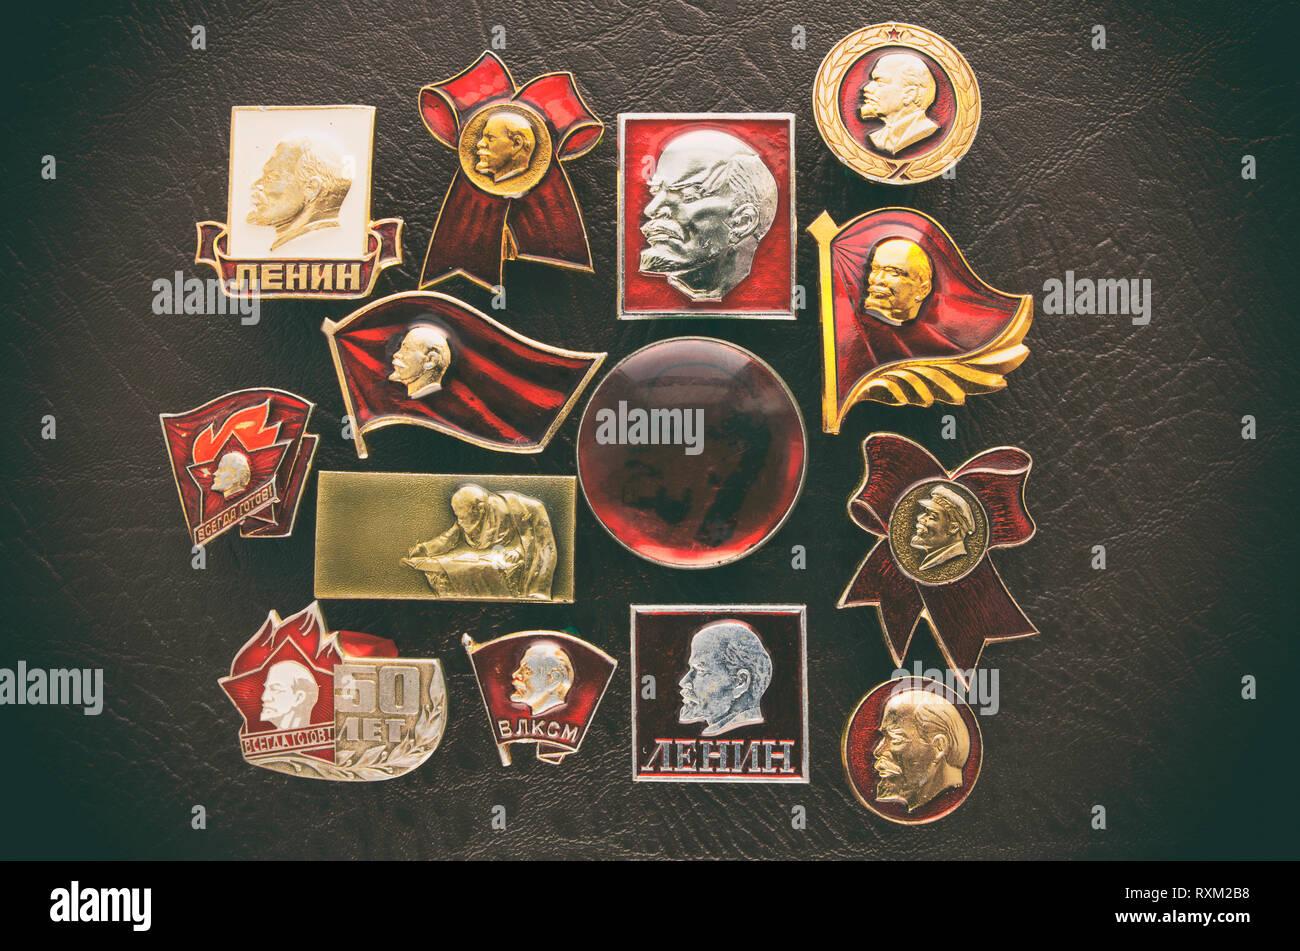 Many metal soviet badges with the image of Communist leader Vladimir Lenin - Stock Image